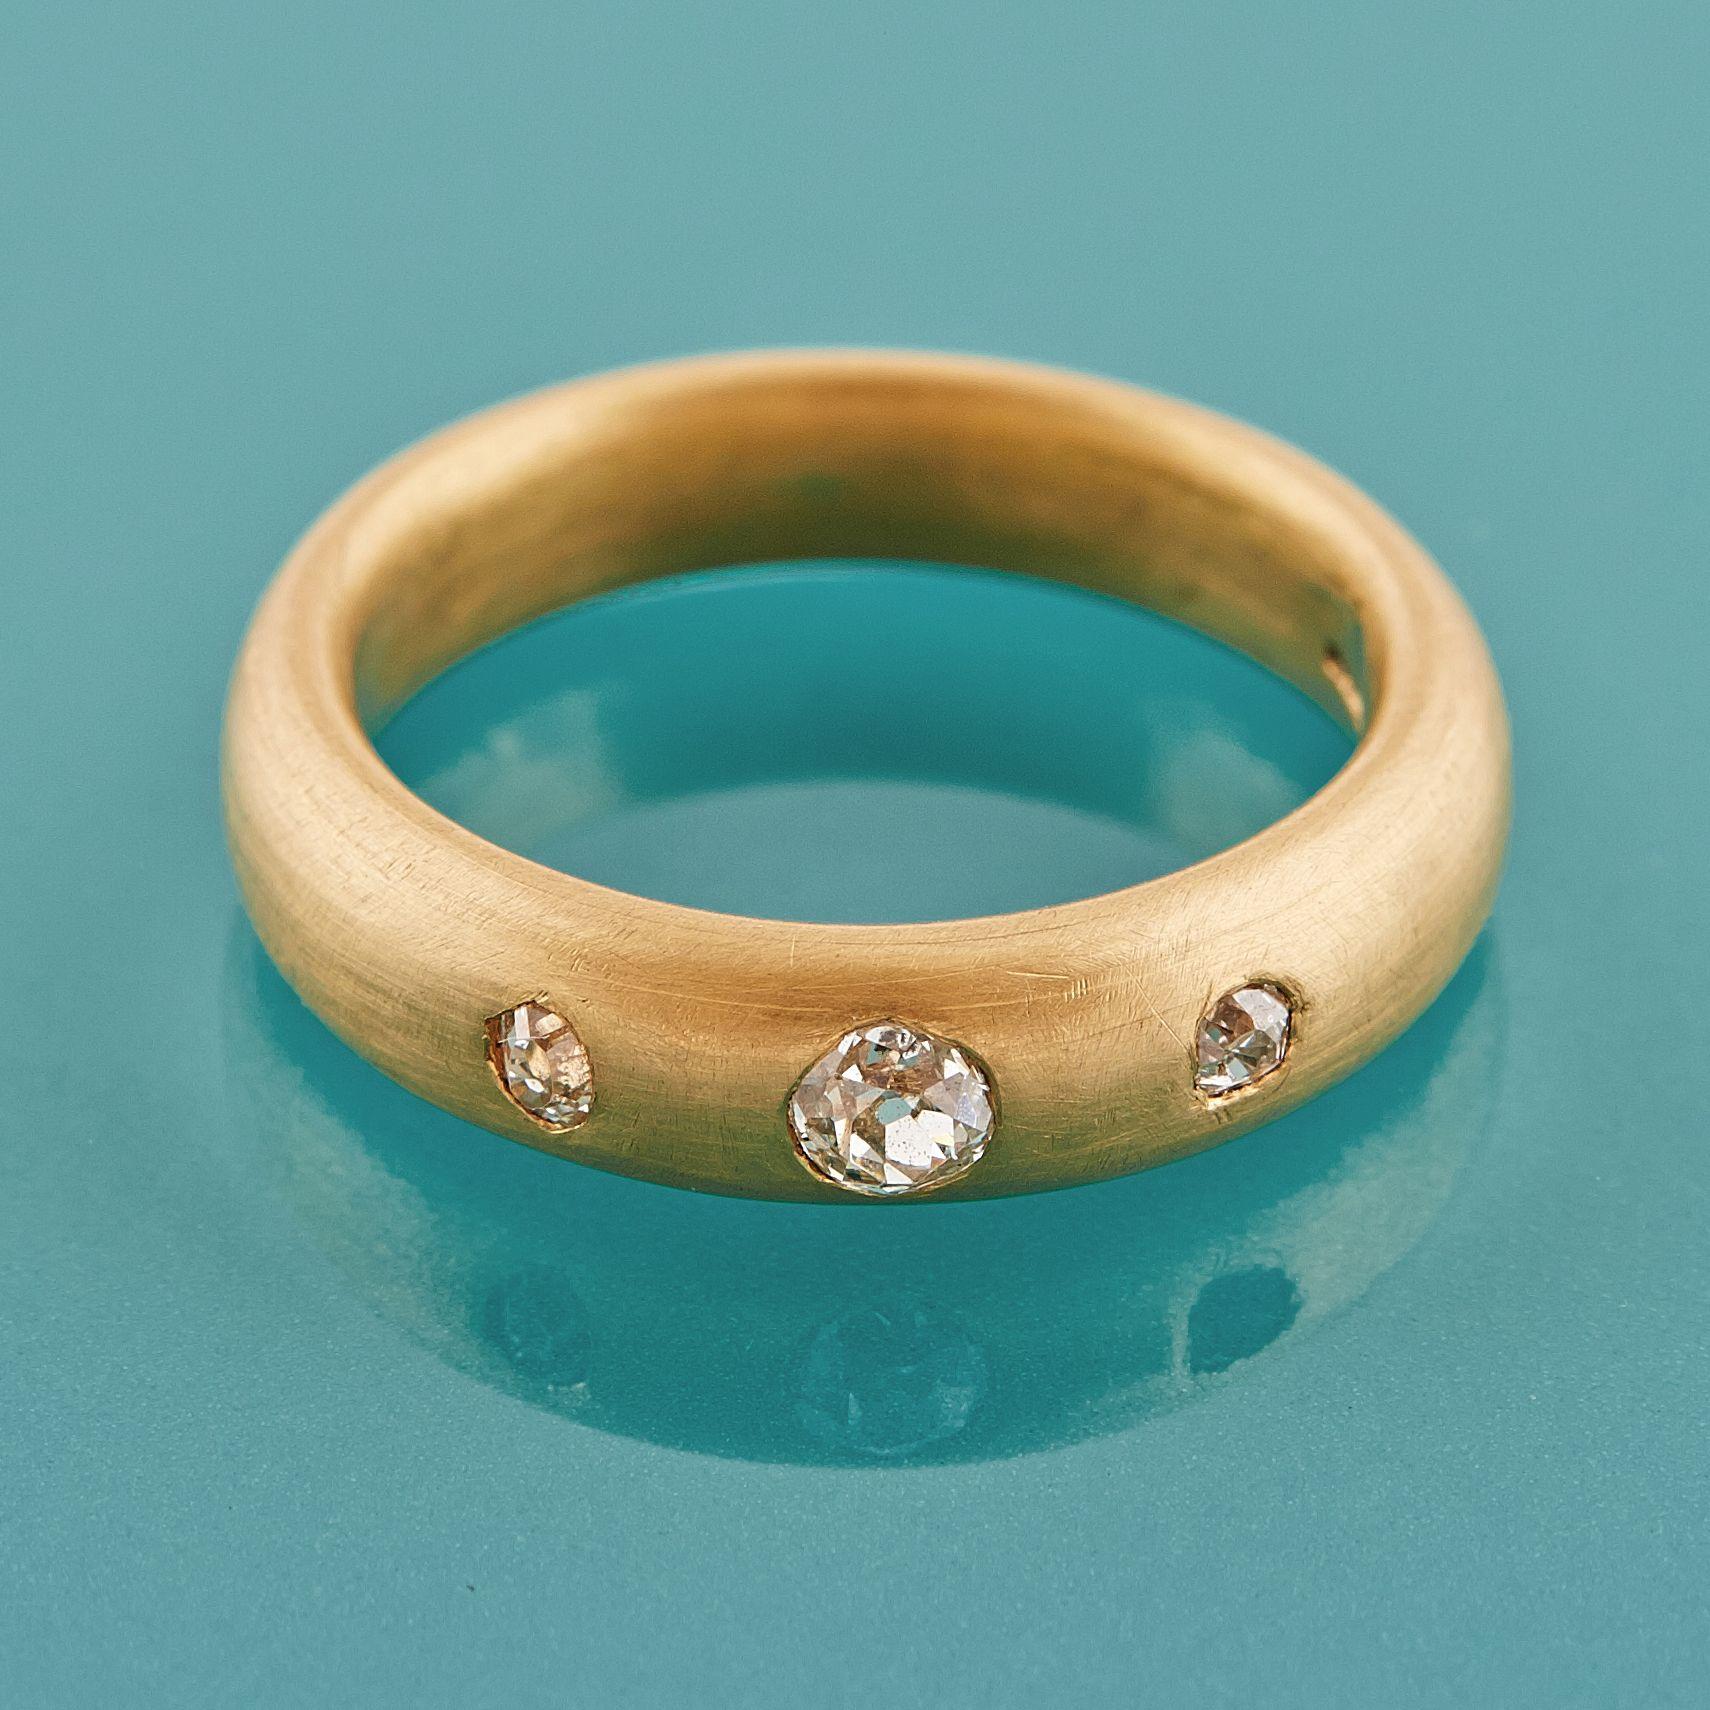 Diamonds Ring In 22ct Gold by Deborah Cadby httpwww